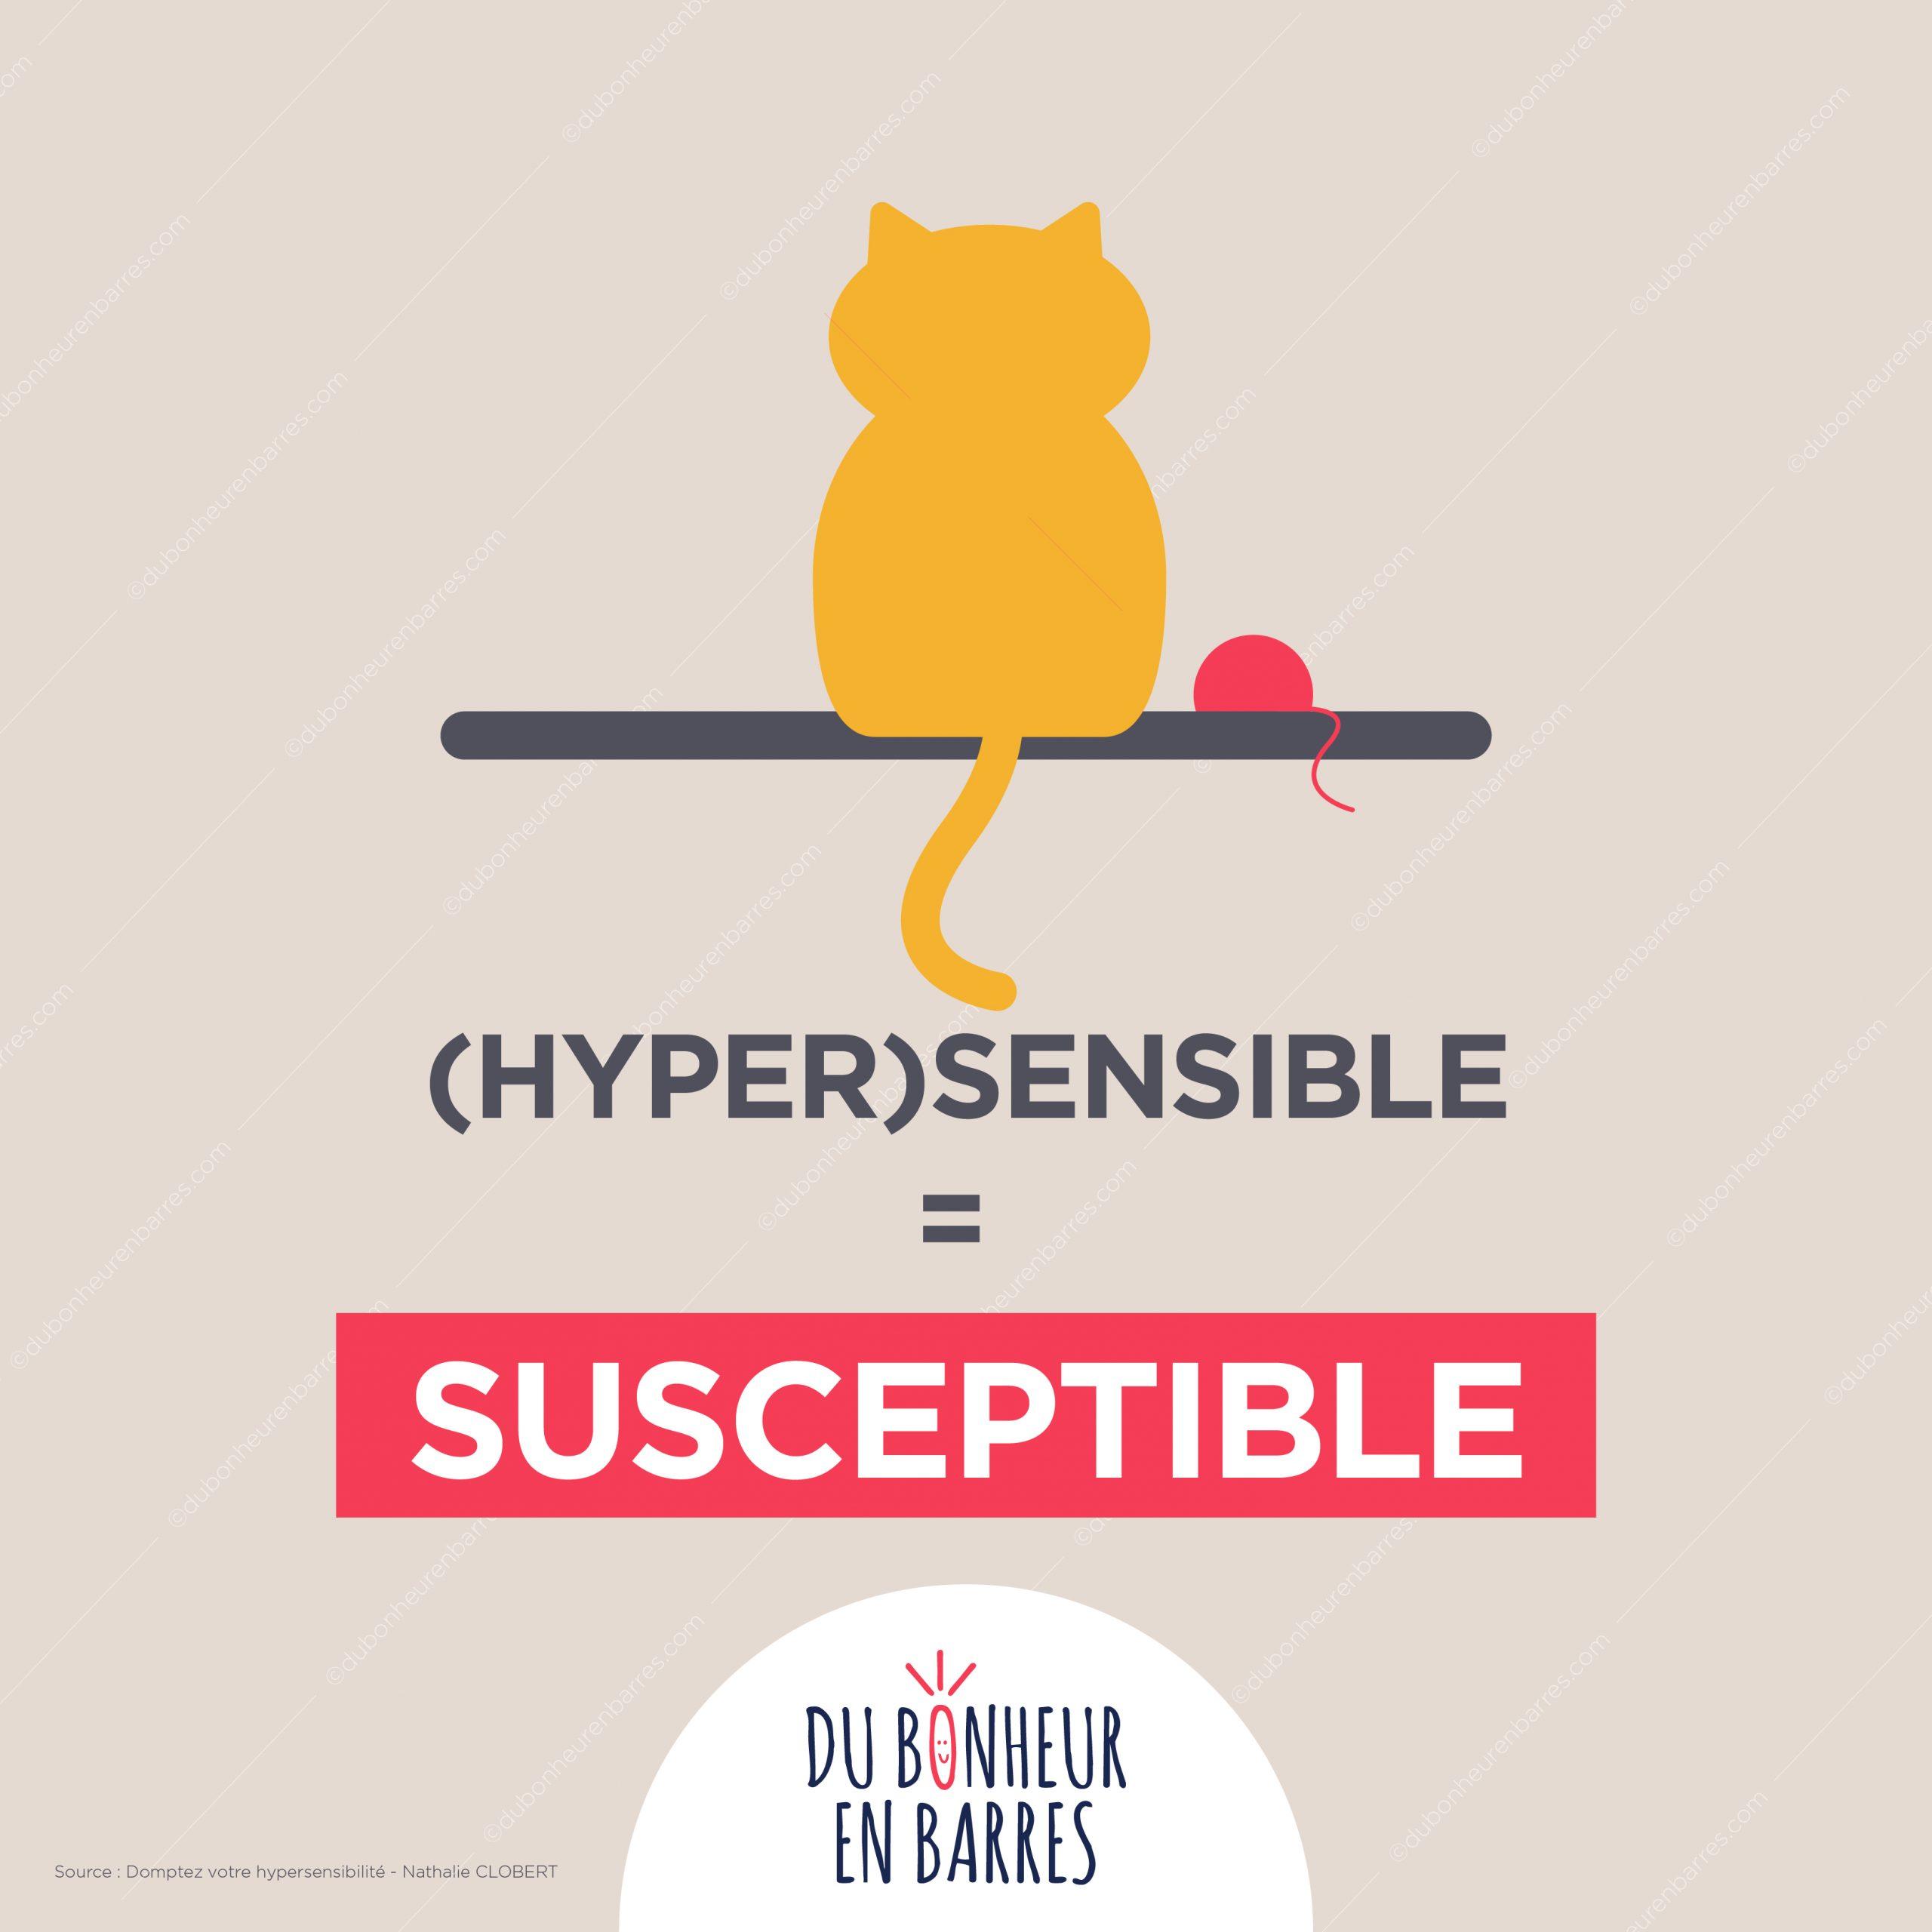 Hypersensible = susceptible